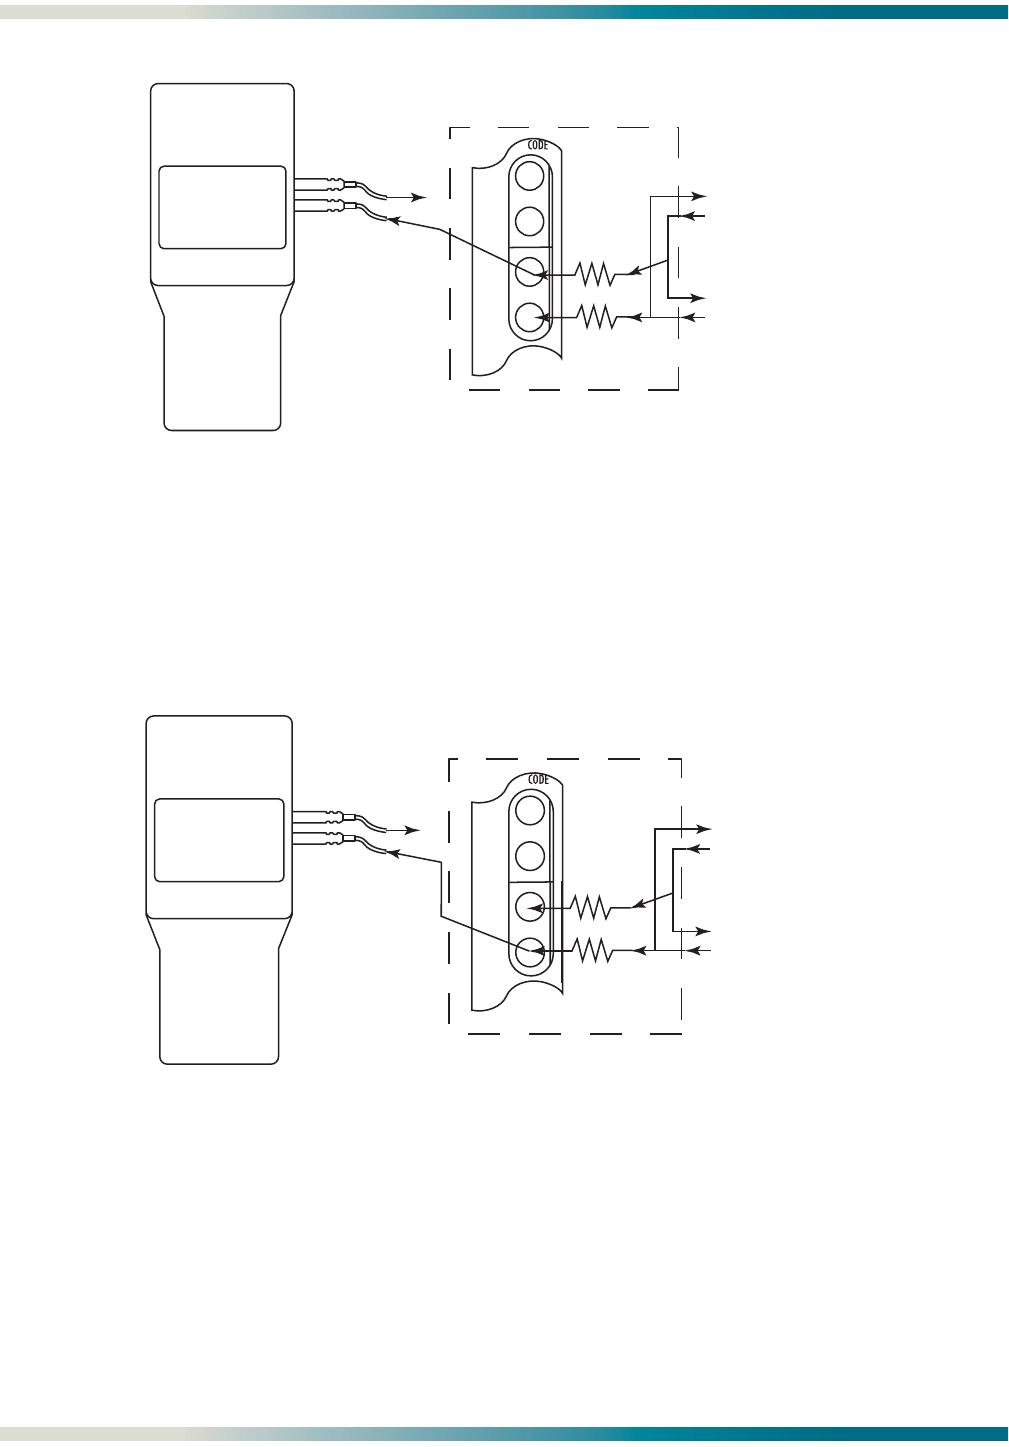 Adtran Hdsl2 Users Manual 61223HDSL2L2 5B